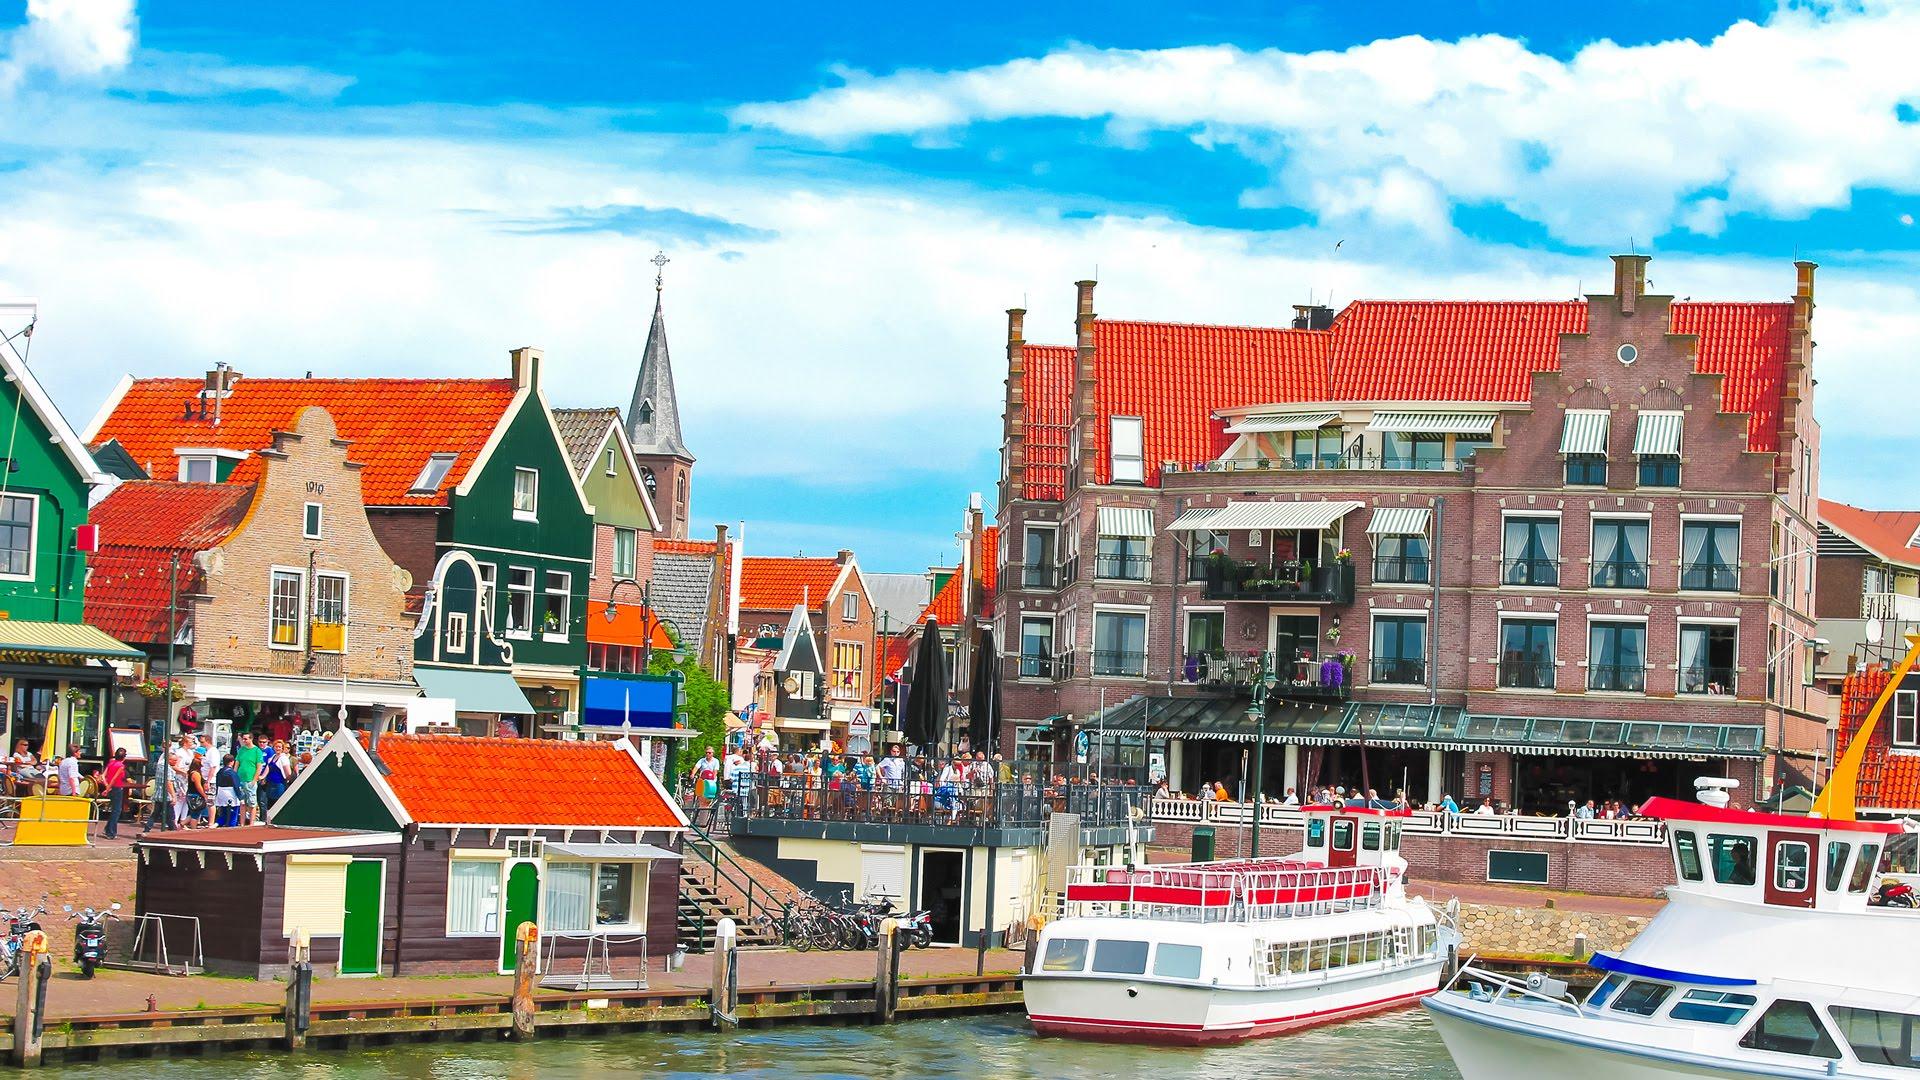 Volendam kota eksotis di Belanda